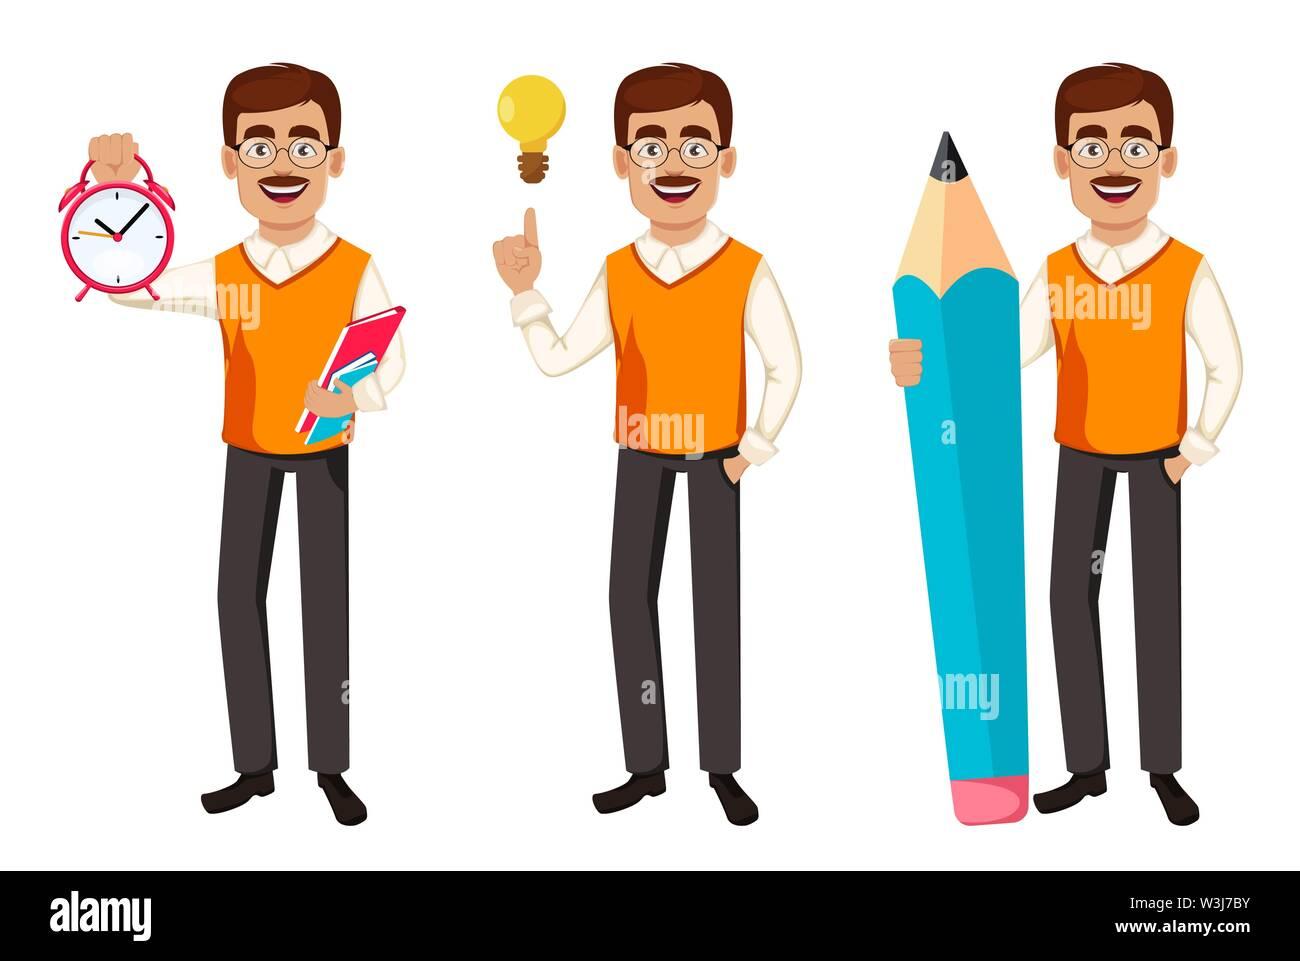 Back to school. Teacher man cartoon character, set of three poses. Teacher's day. Vector illustration - Stock Image